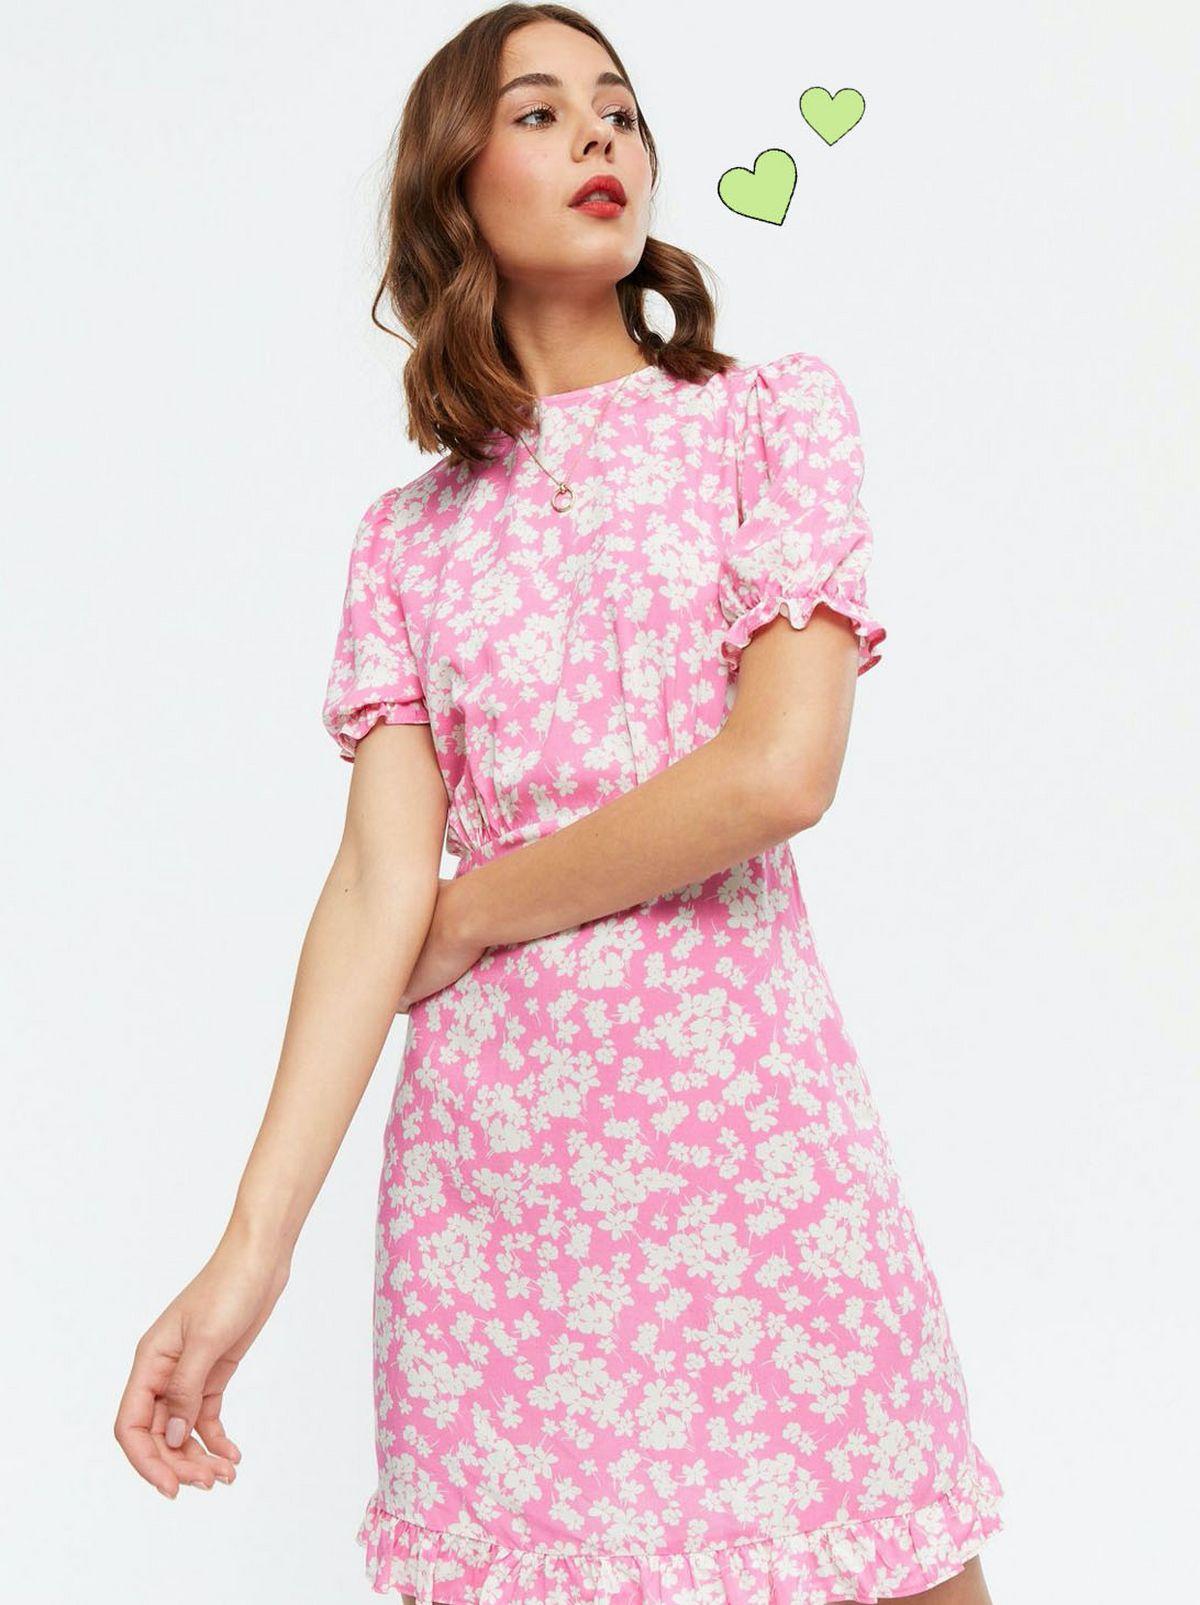 Woman wearing a Pink Floral Frill Mini Dress.